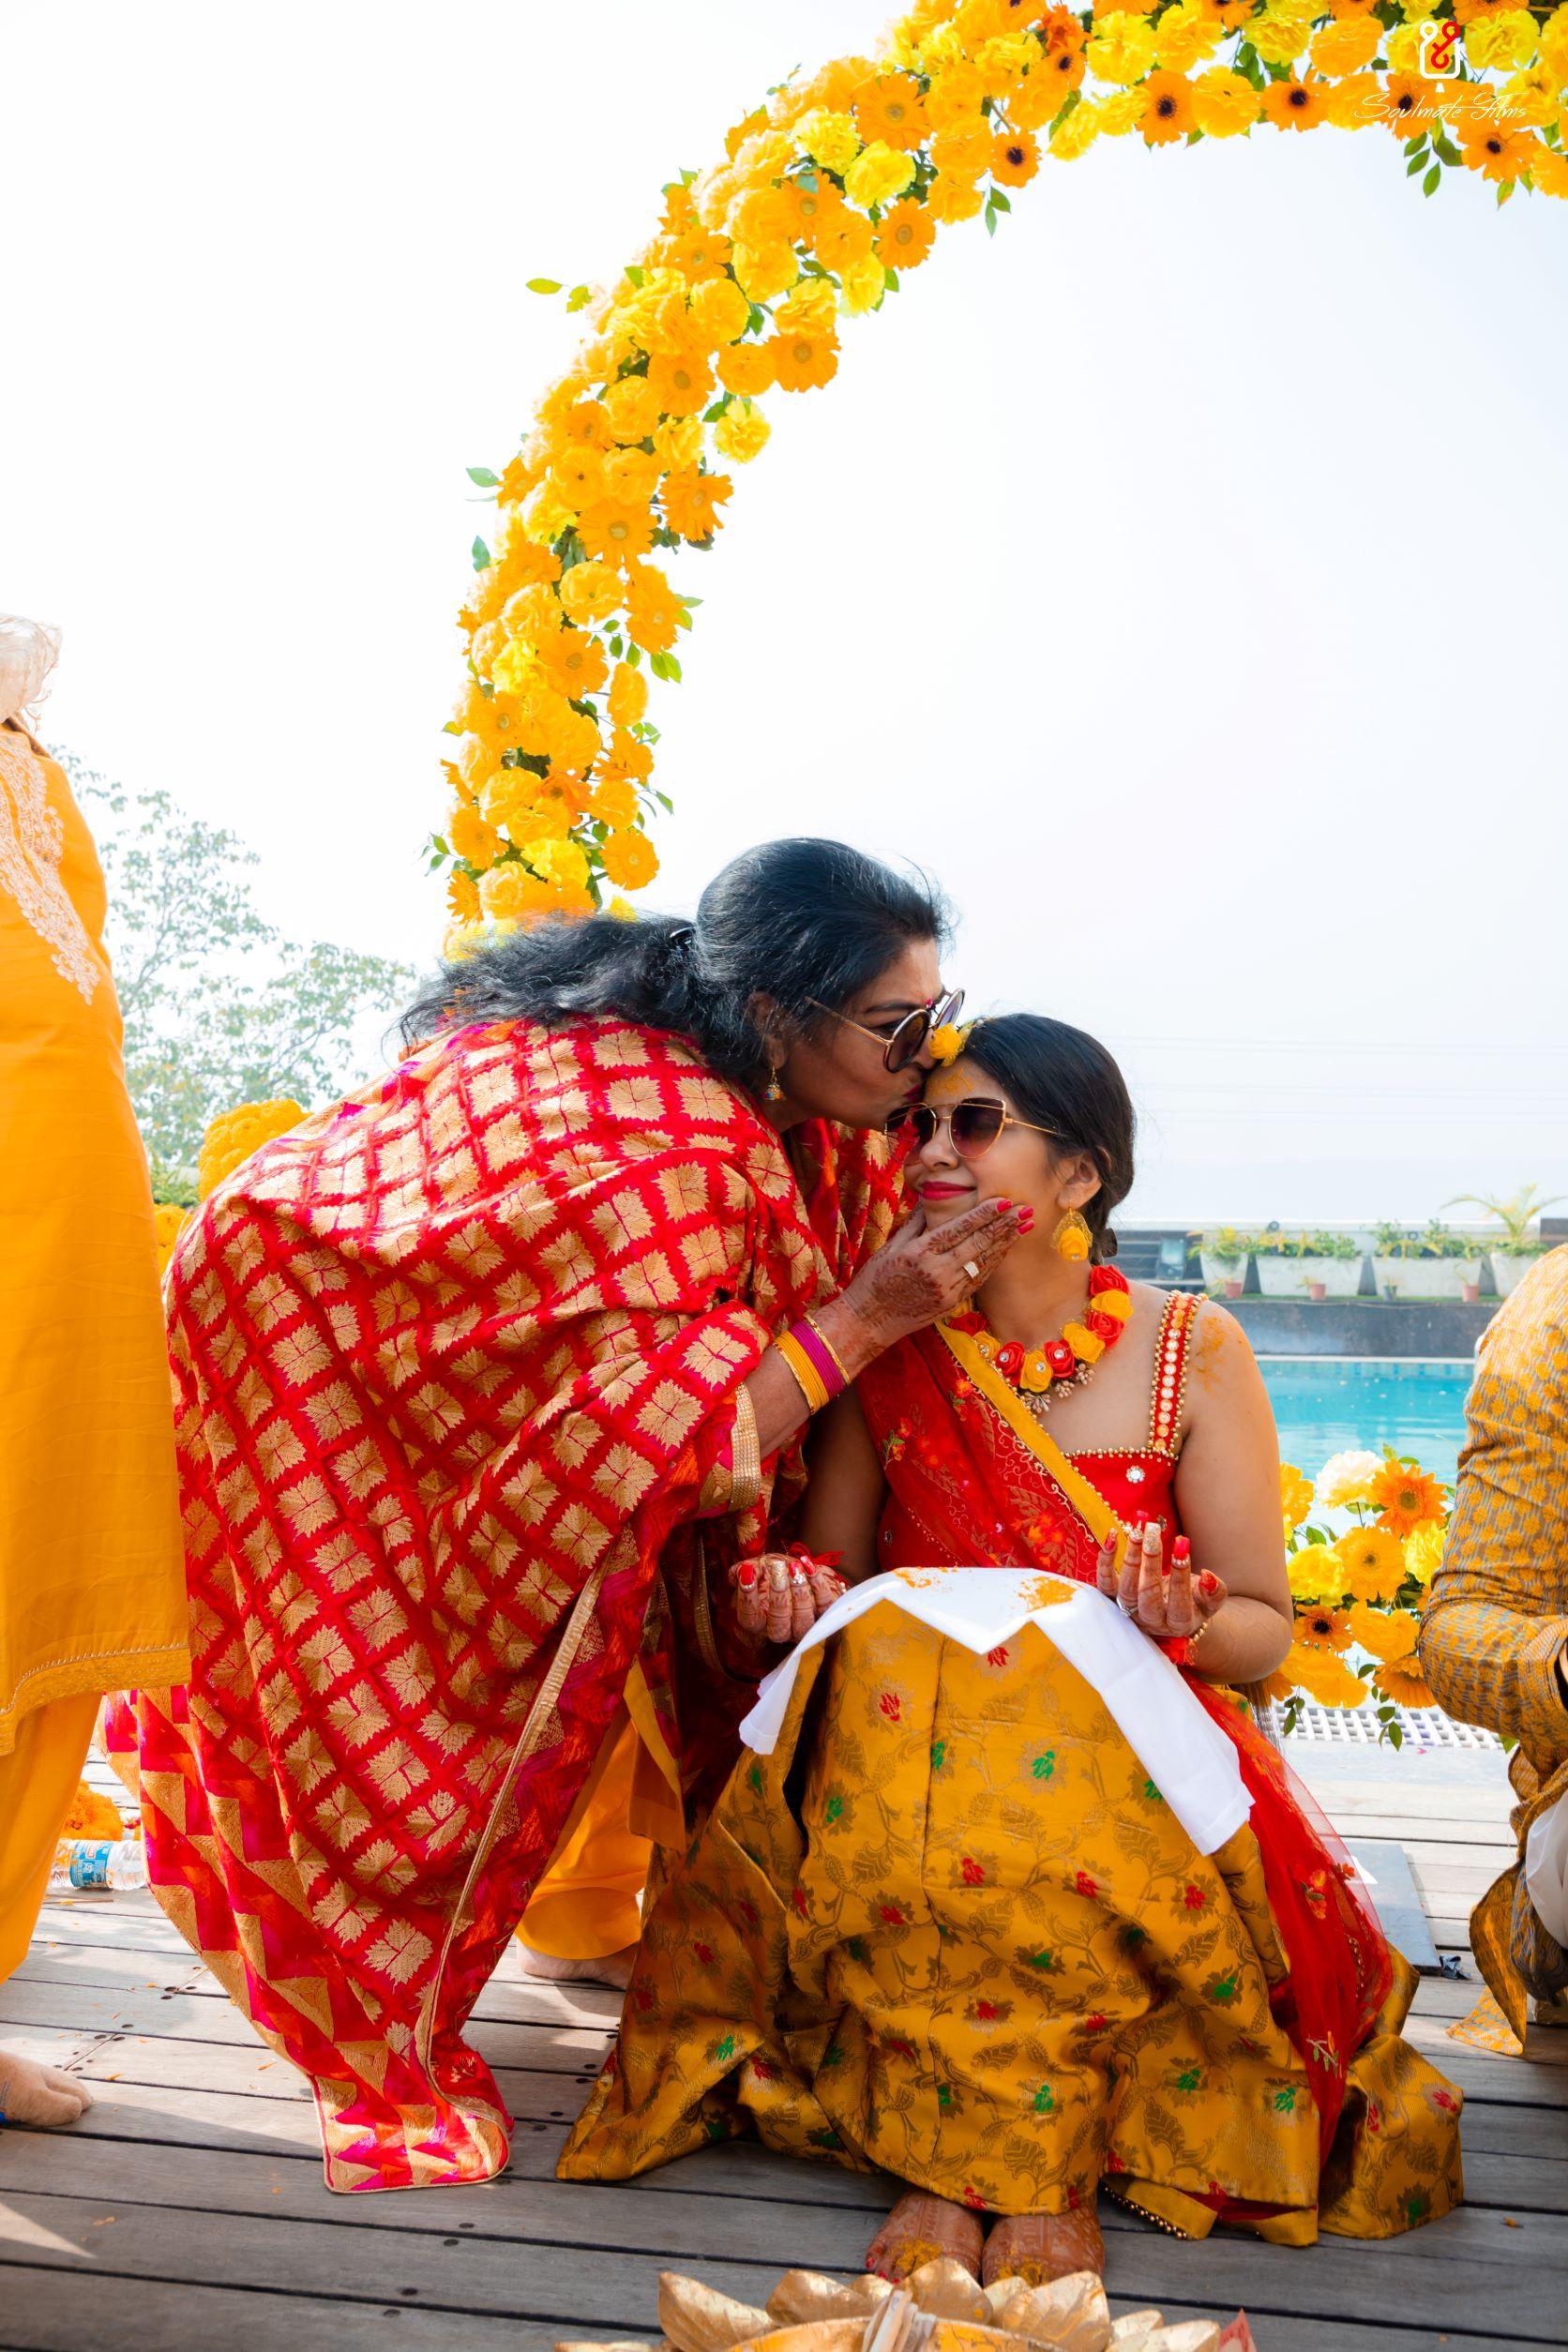 candid shot of the bride at her haldi